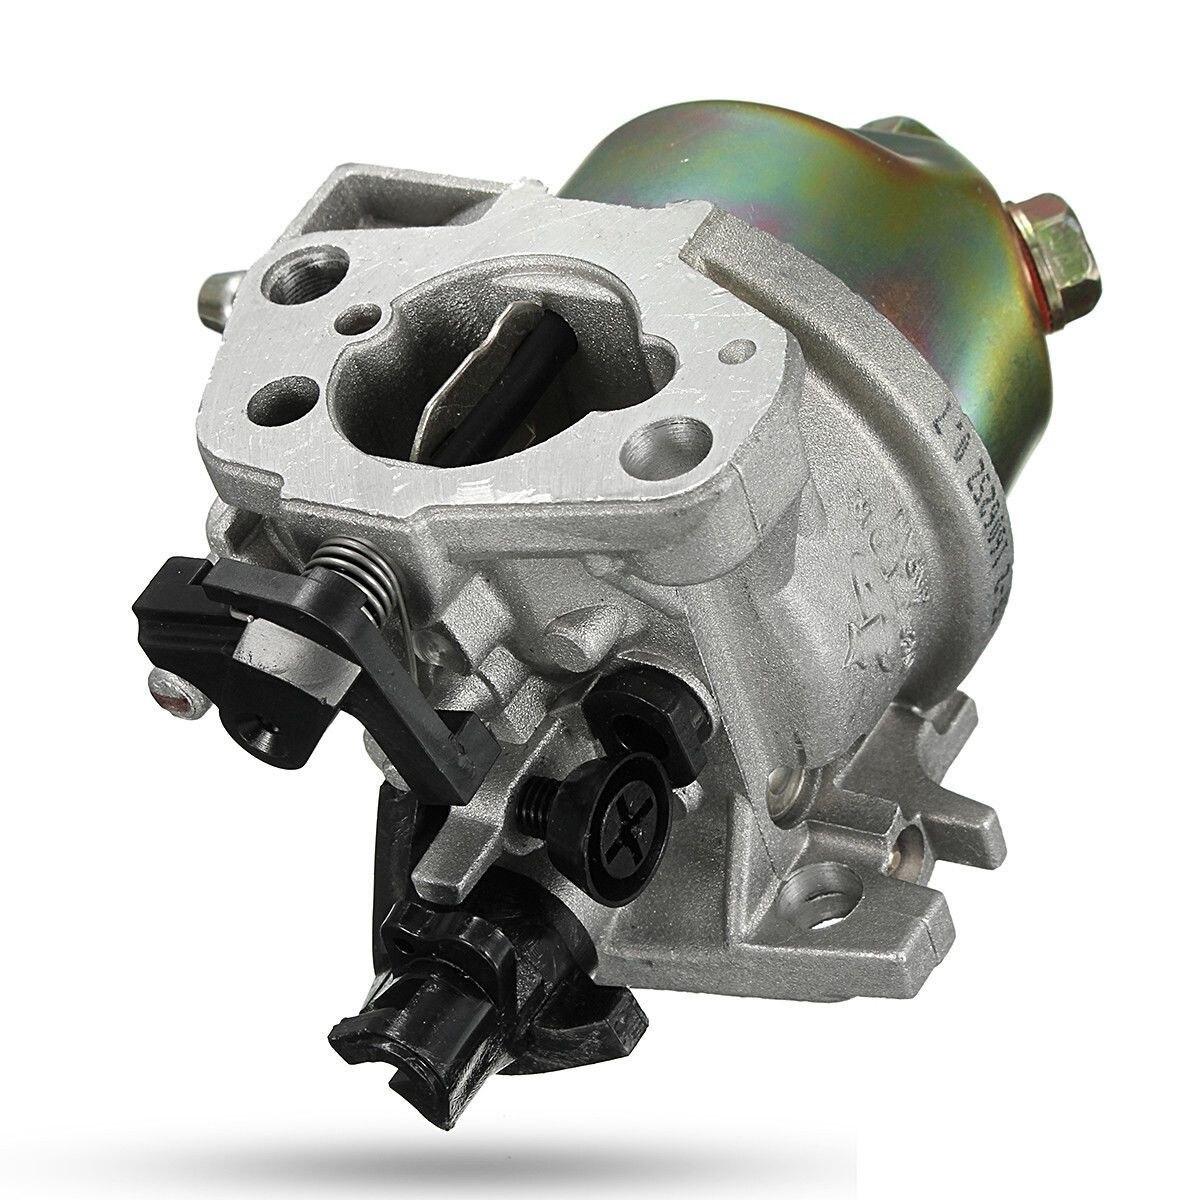 1 X Carburetor Carb For Part No. 751-10309 & 951-10309 MTD OHV Engine Carburetor